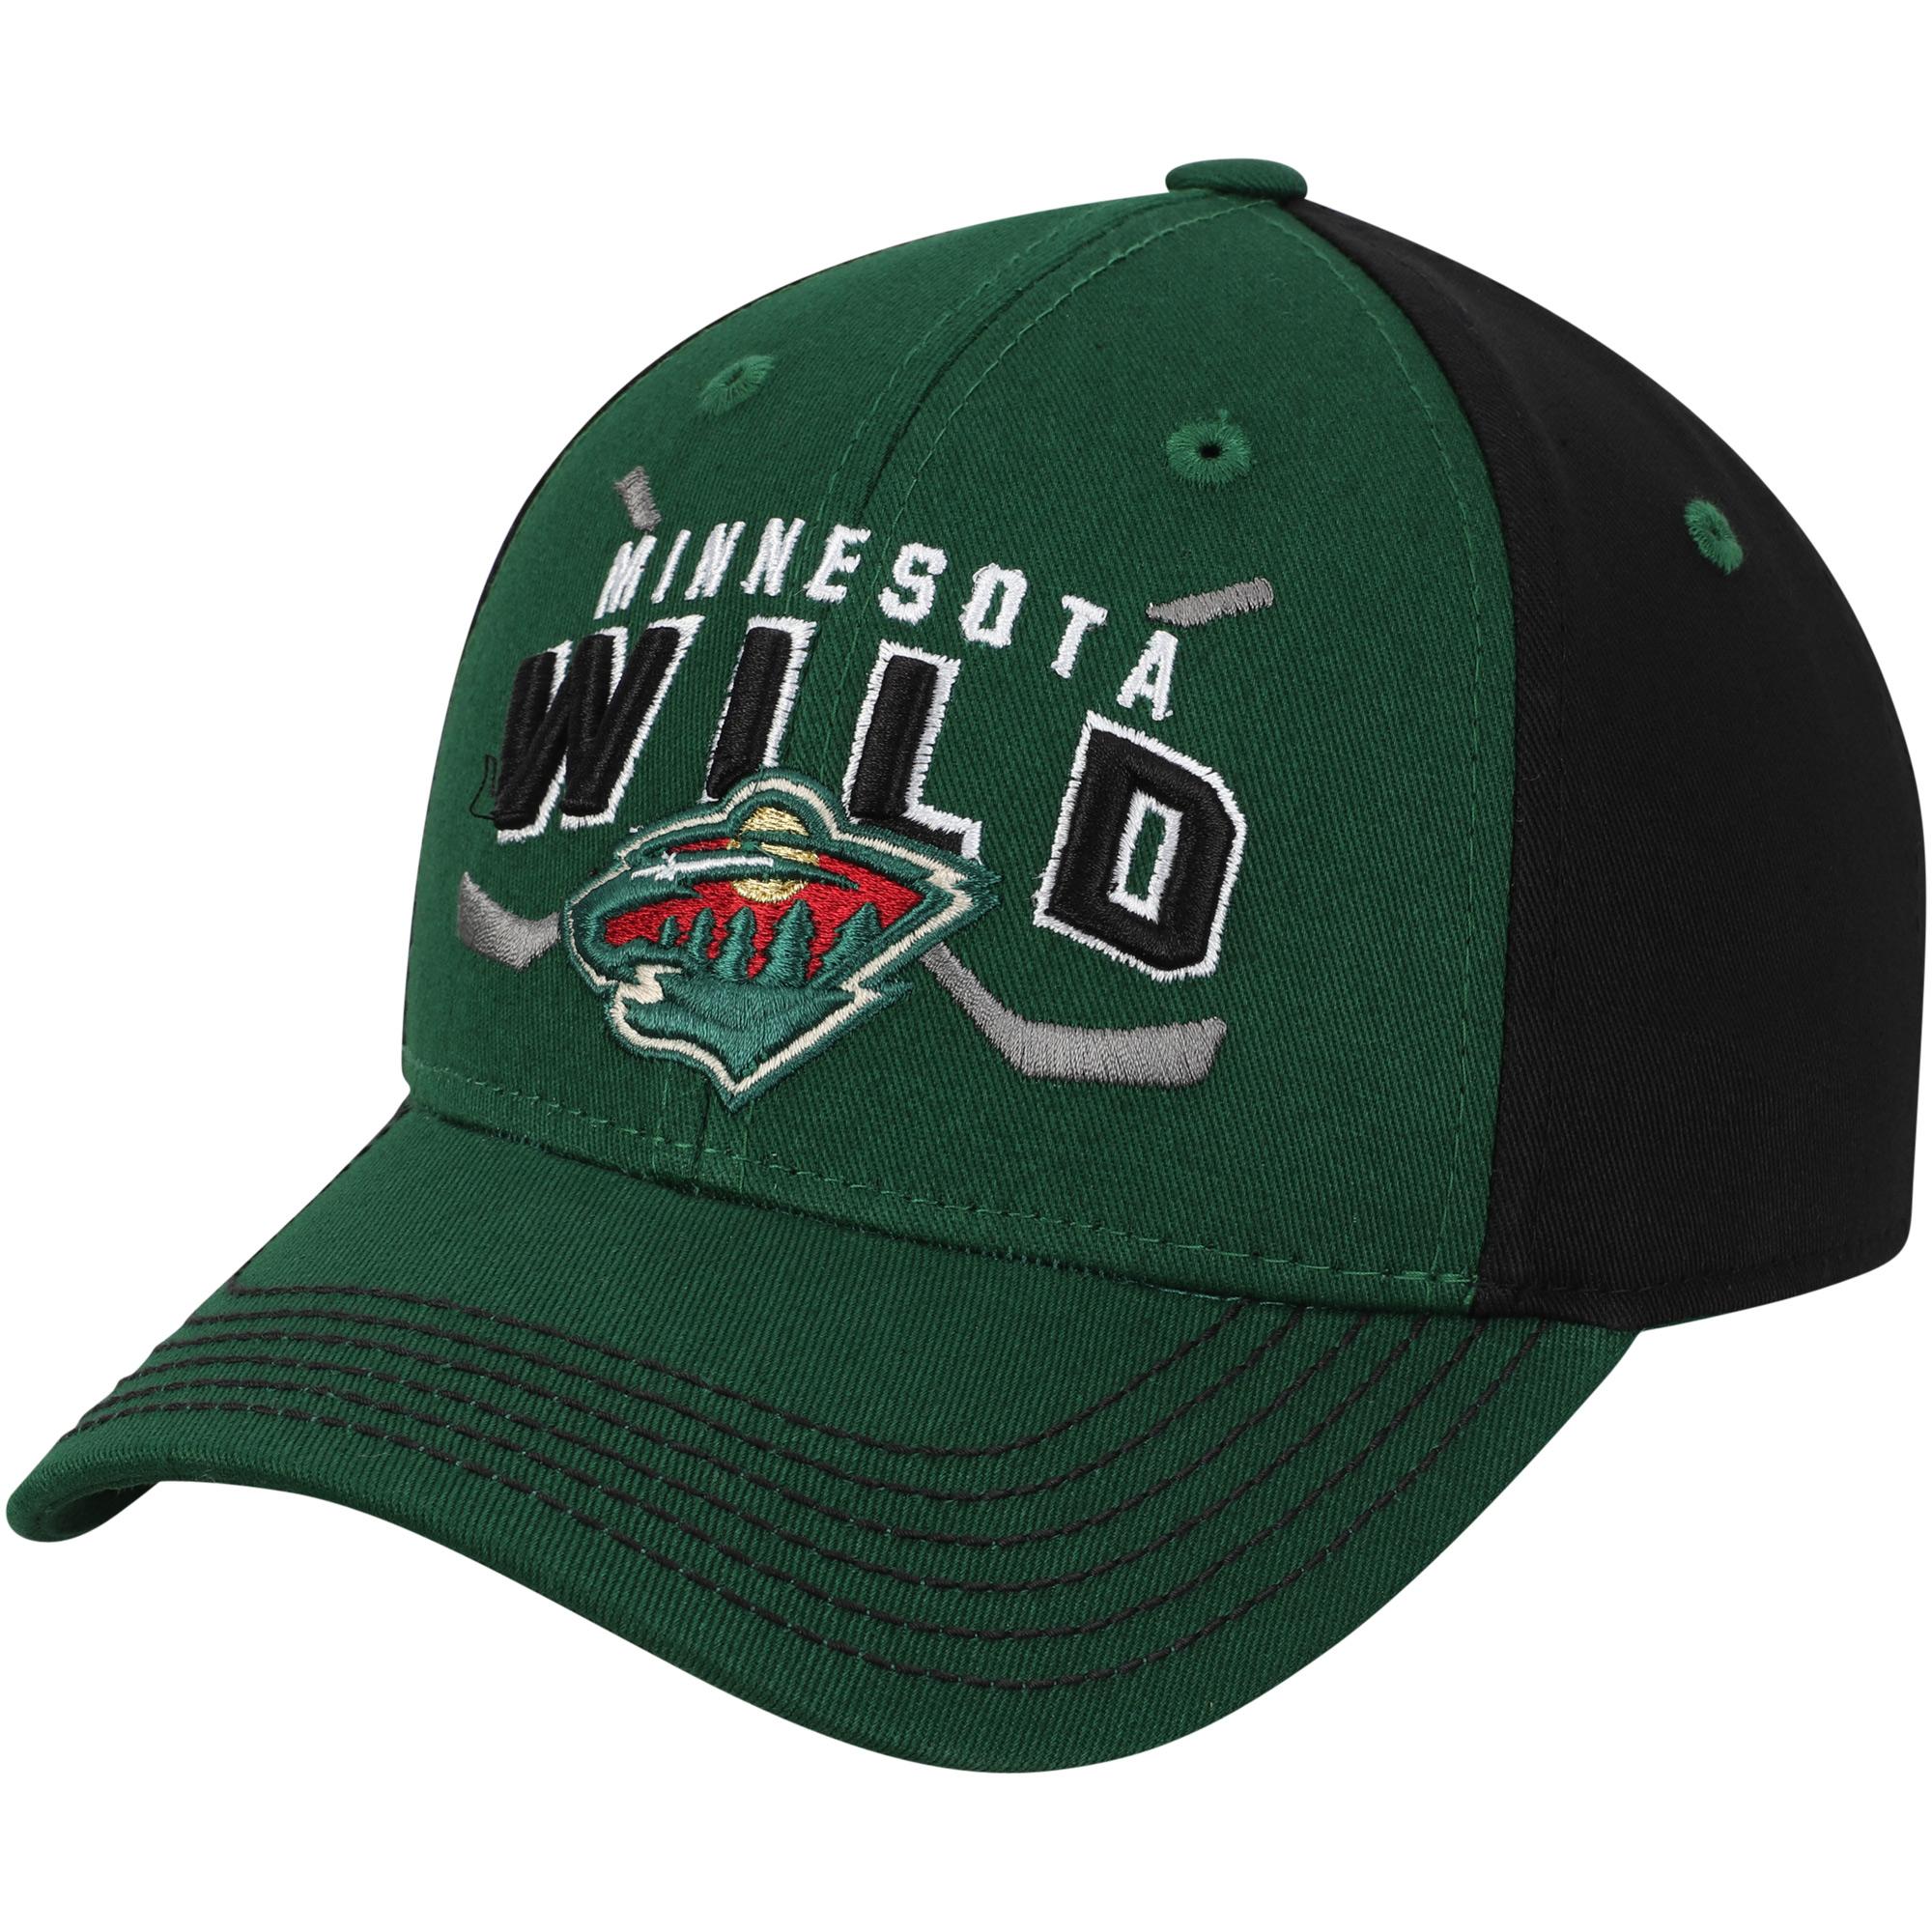 Minnesota Wild Youth Faceoff Adjustable Hat - Green - OSFA